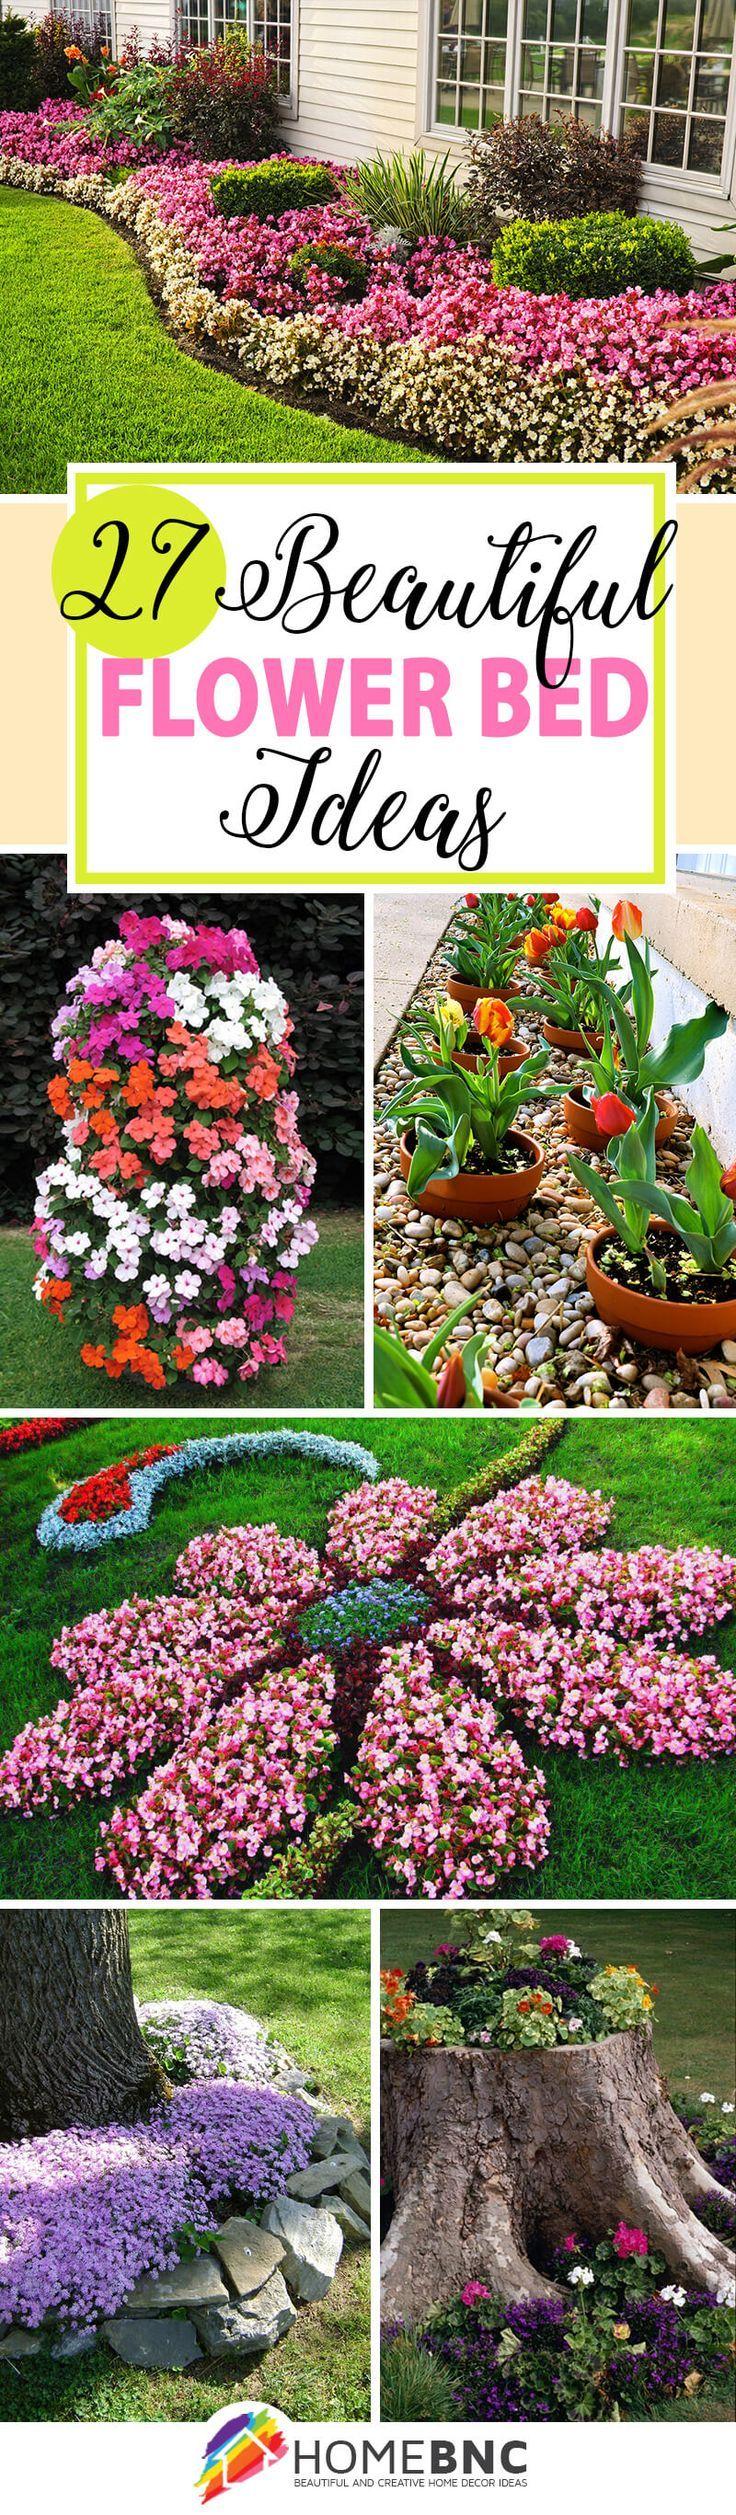 17 best images about gardening on pinterest gardening for Garden design hacks